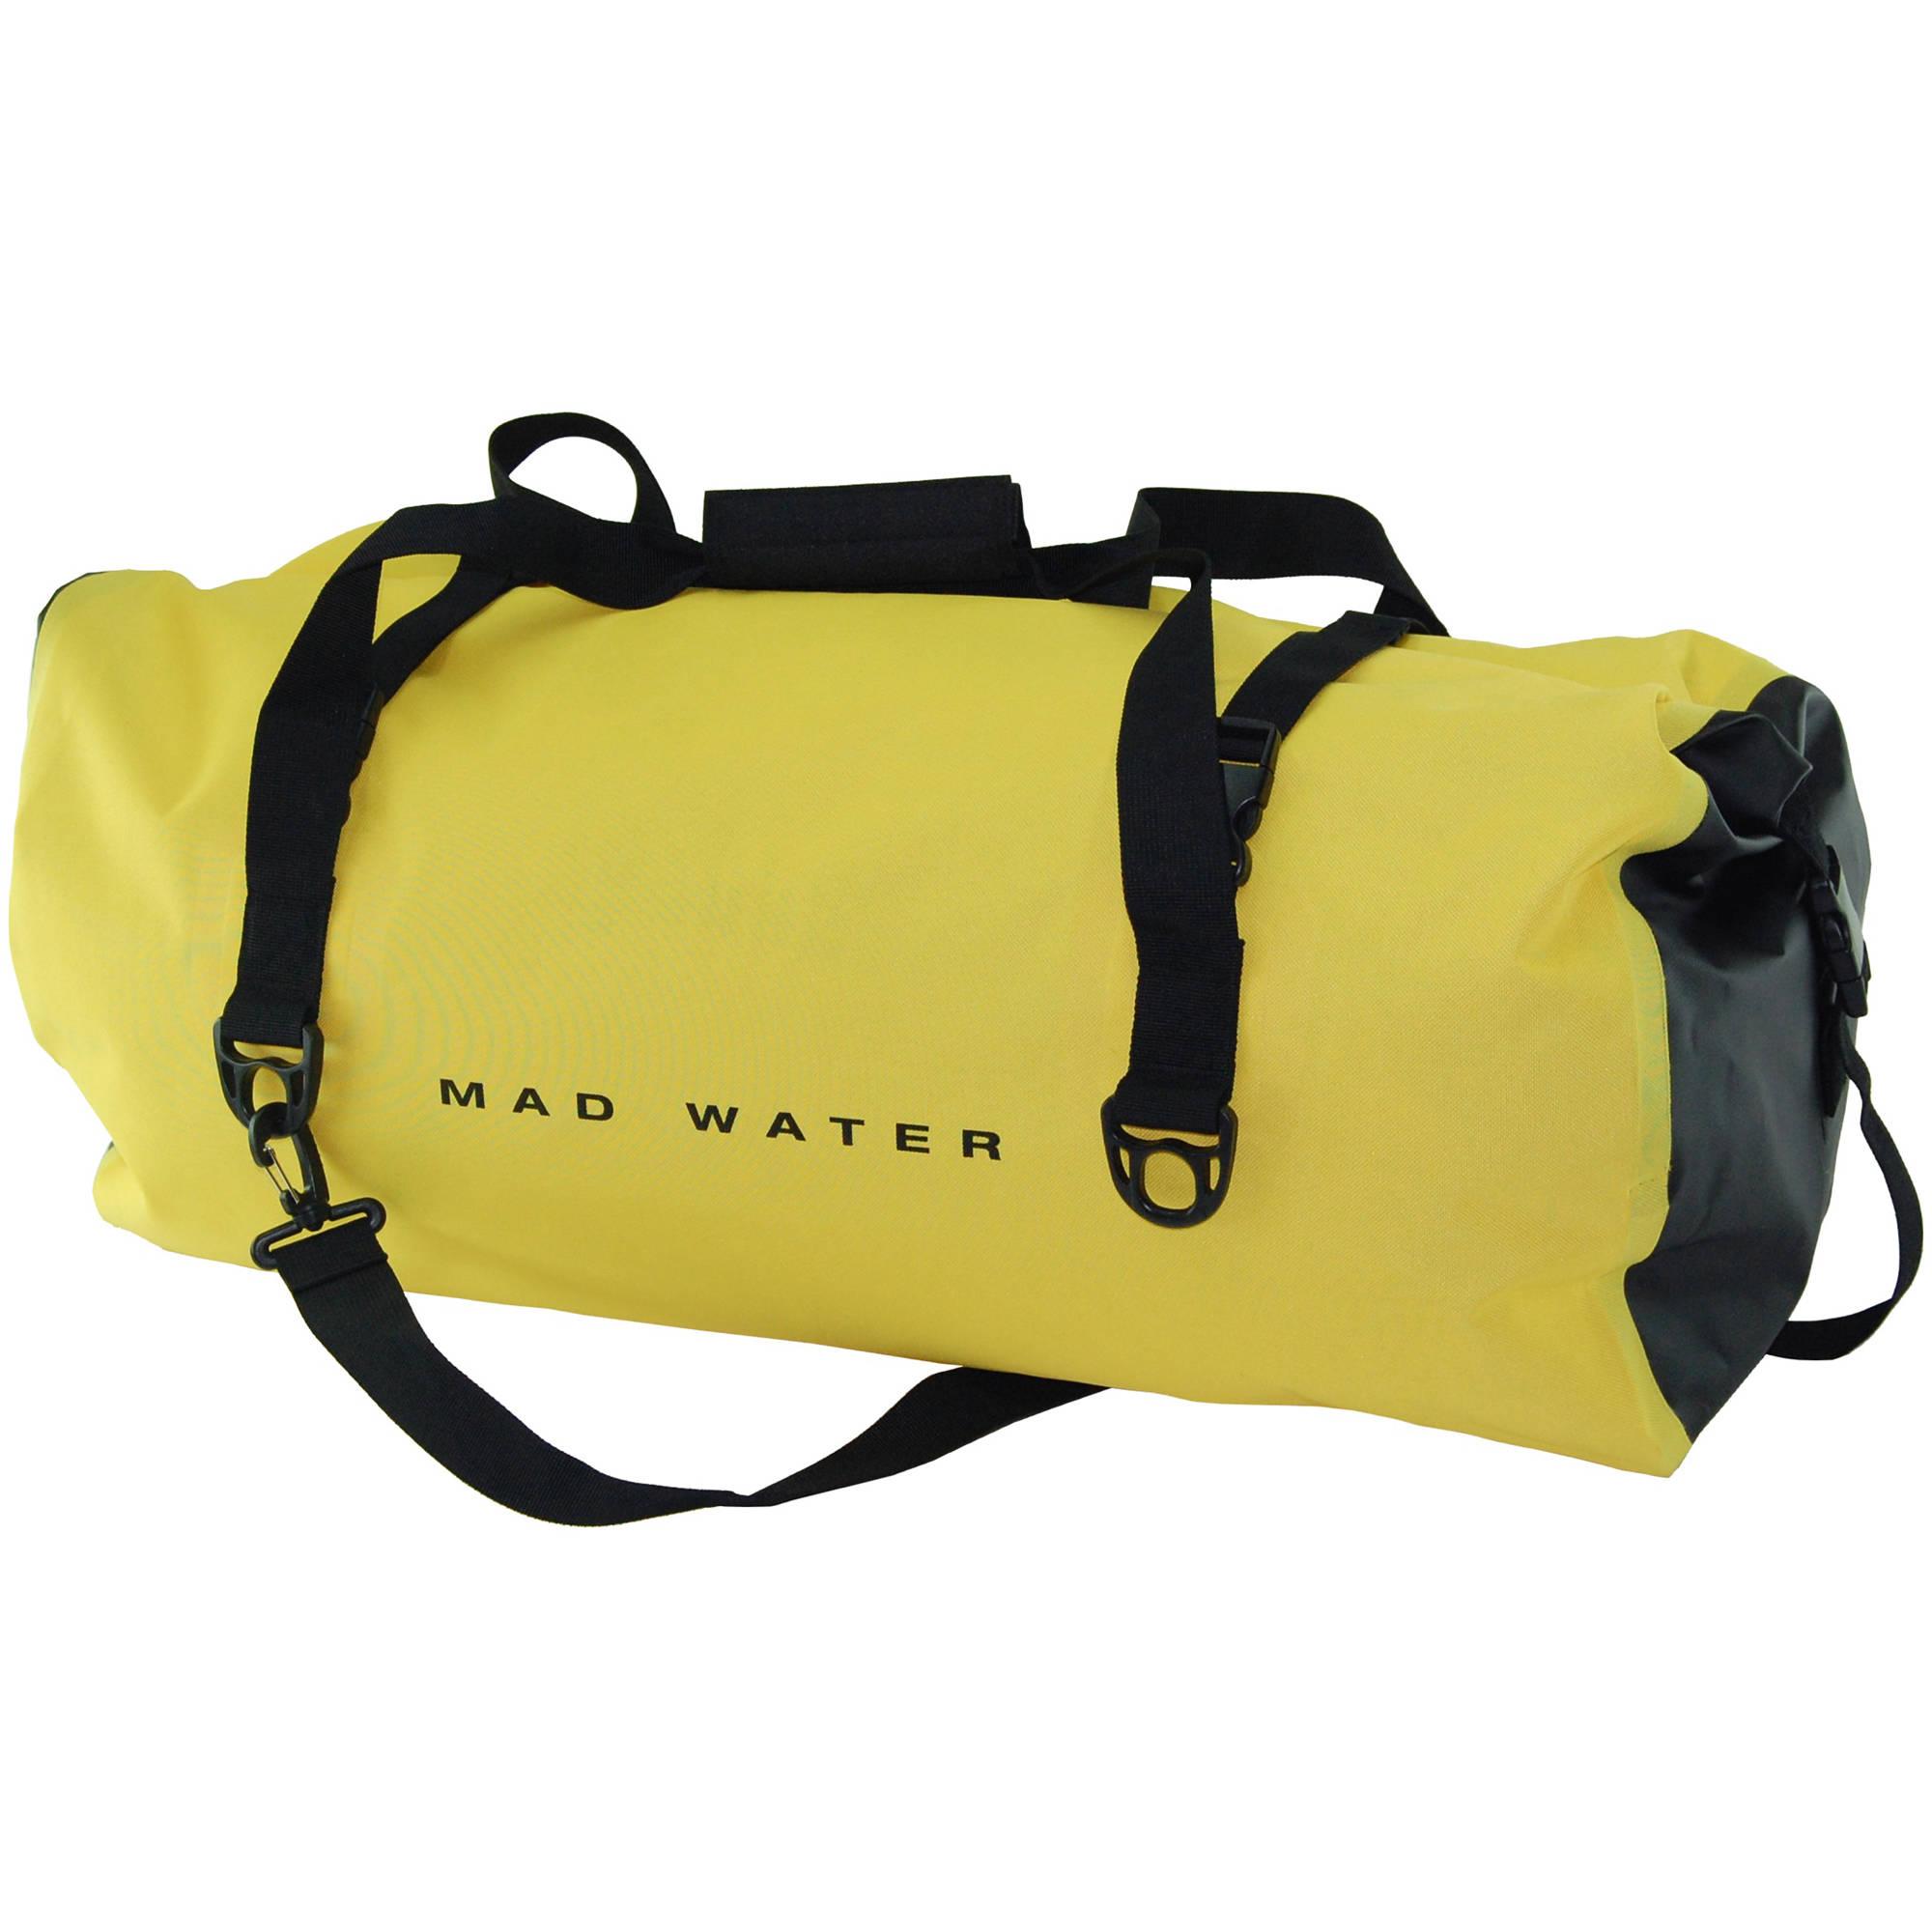 Mad Water Classic Roll Top Waterproof Duffel Bag 60l Yellow